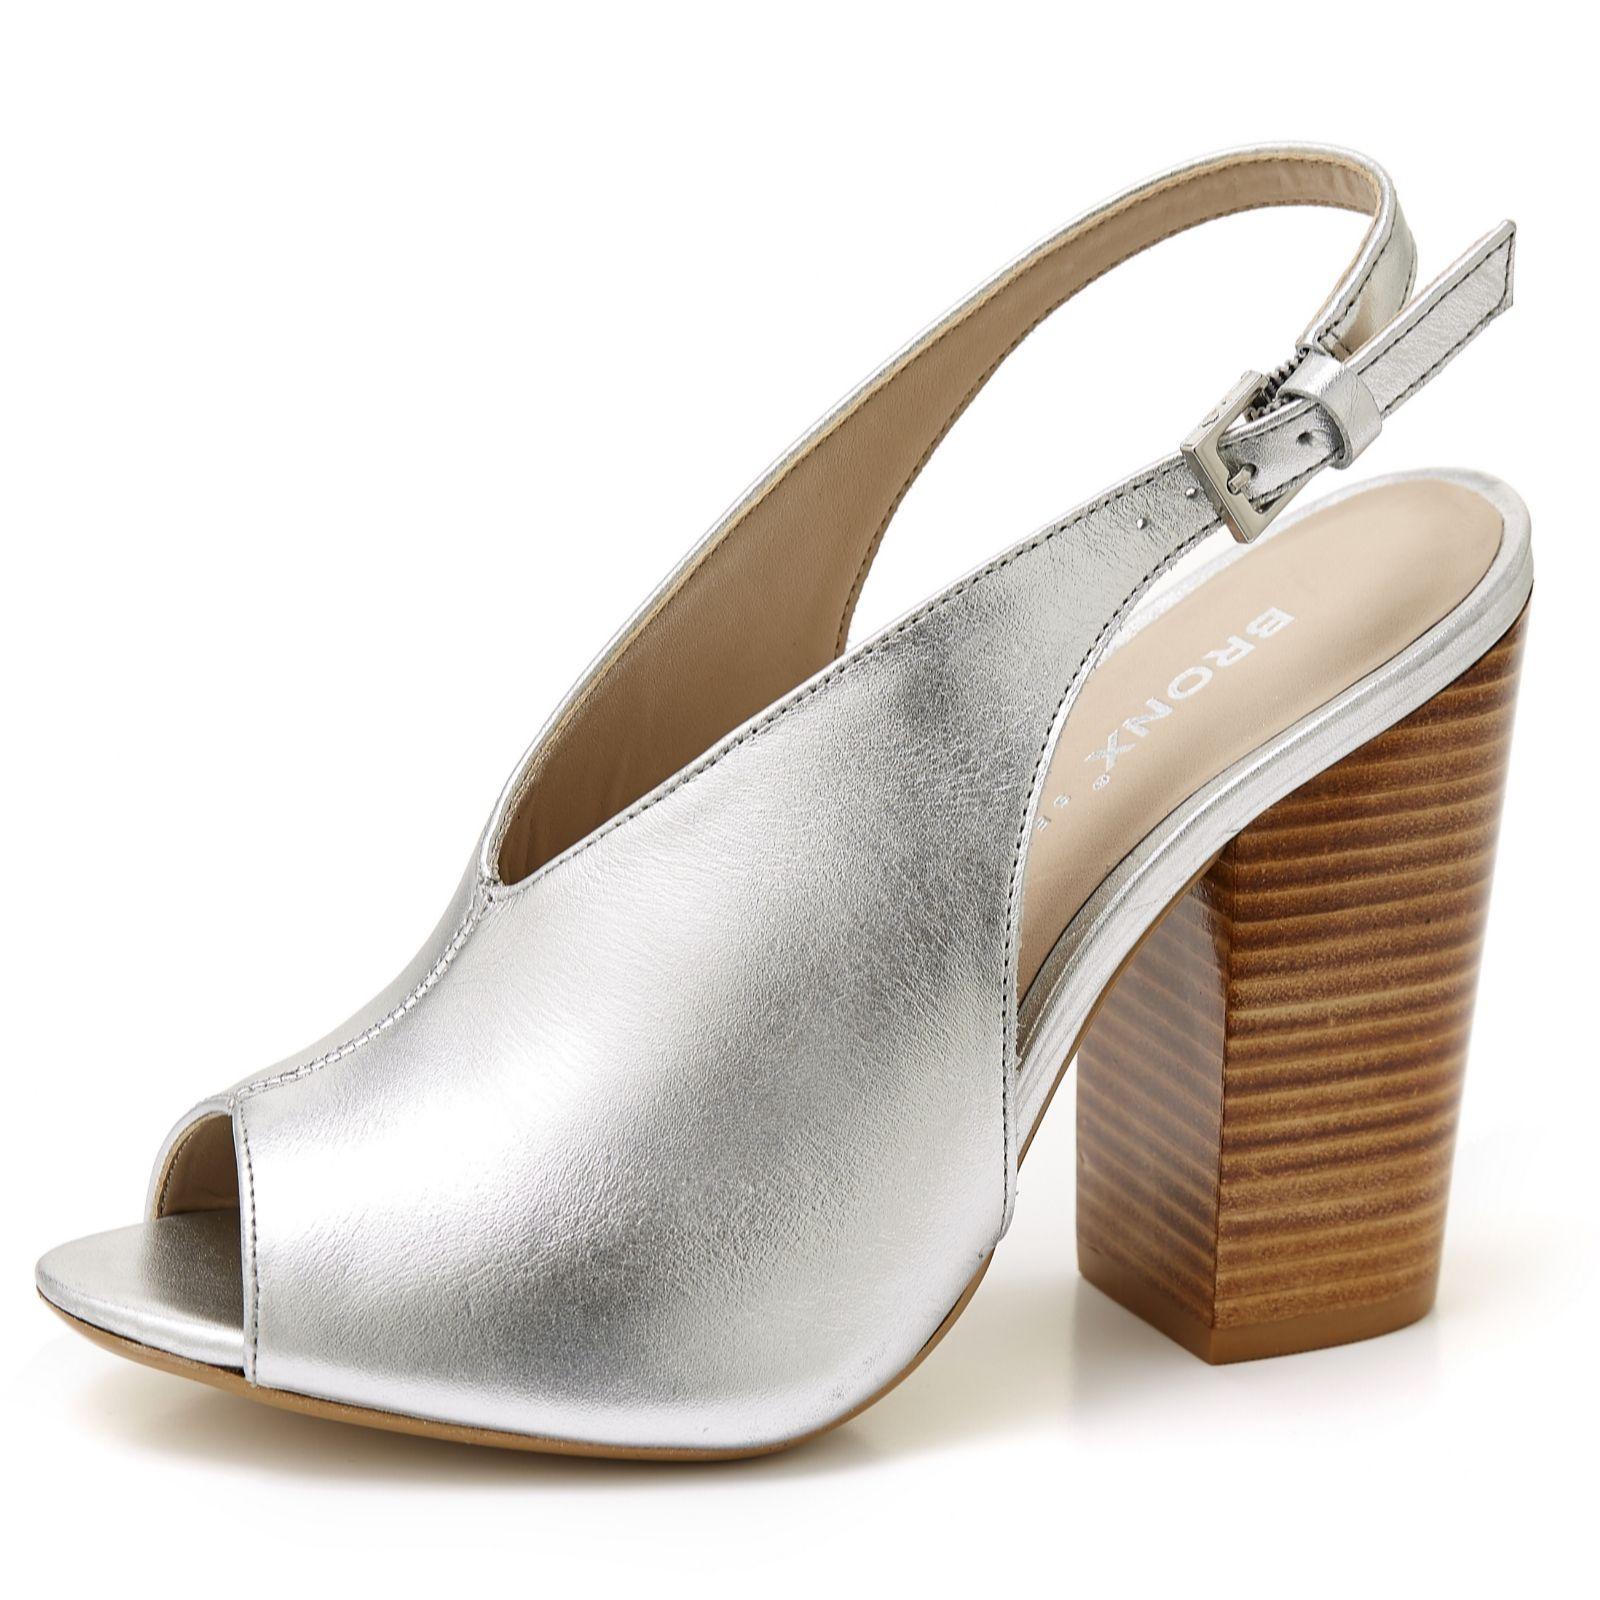 3aaafe4b3ea8 Bronx Leather Peep Toe Block Heel Shoe - QVC UK